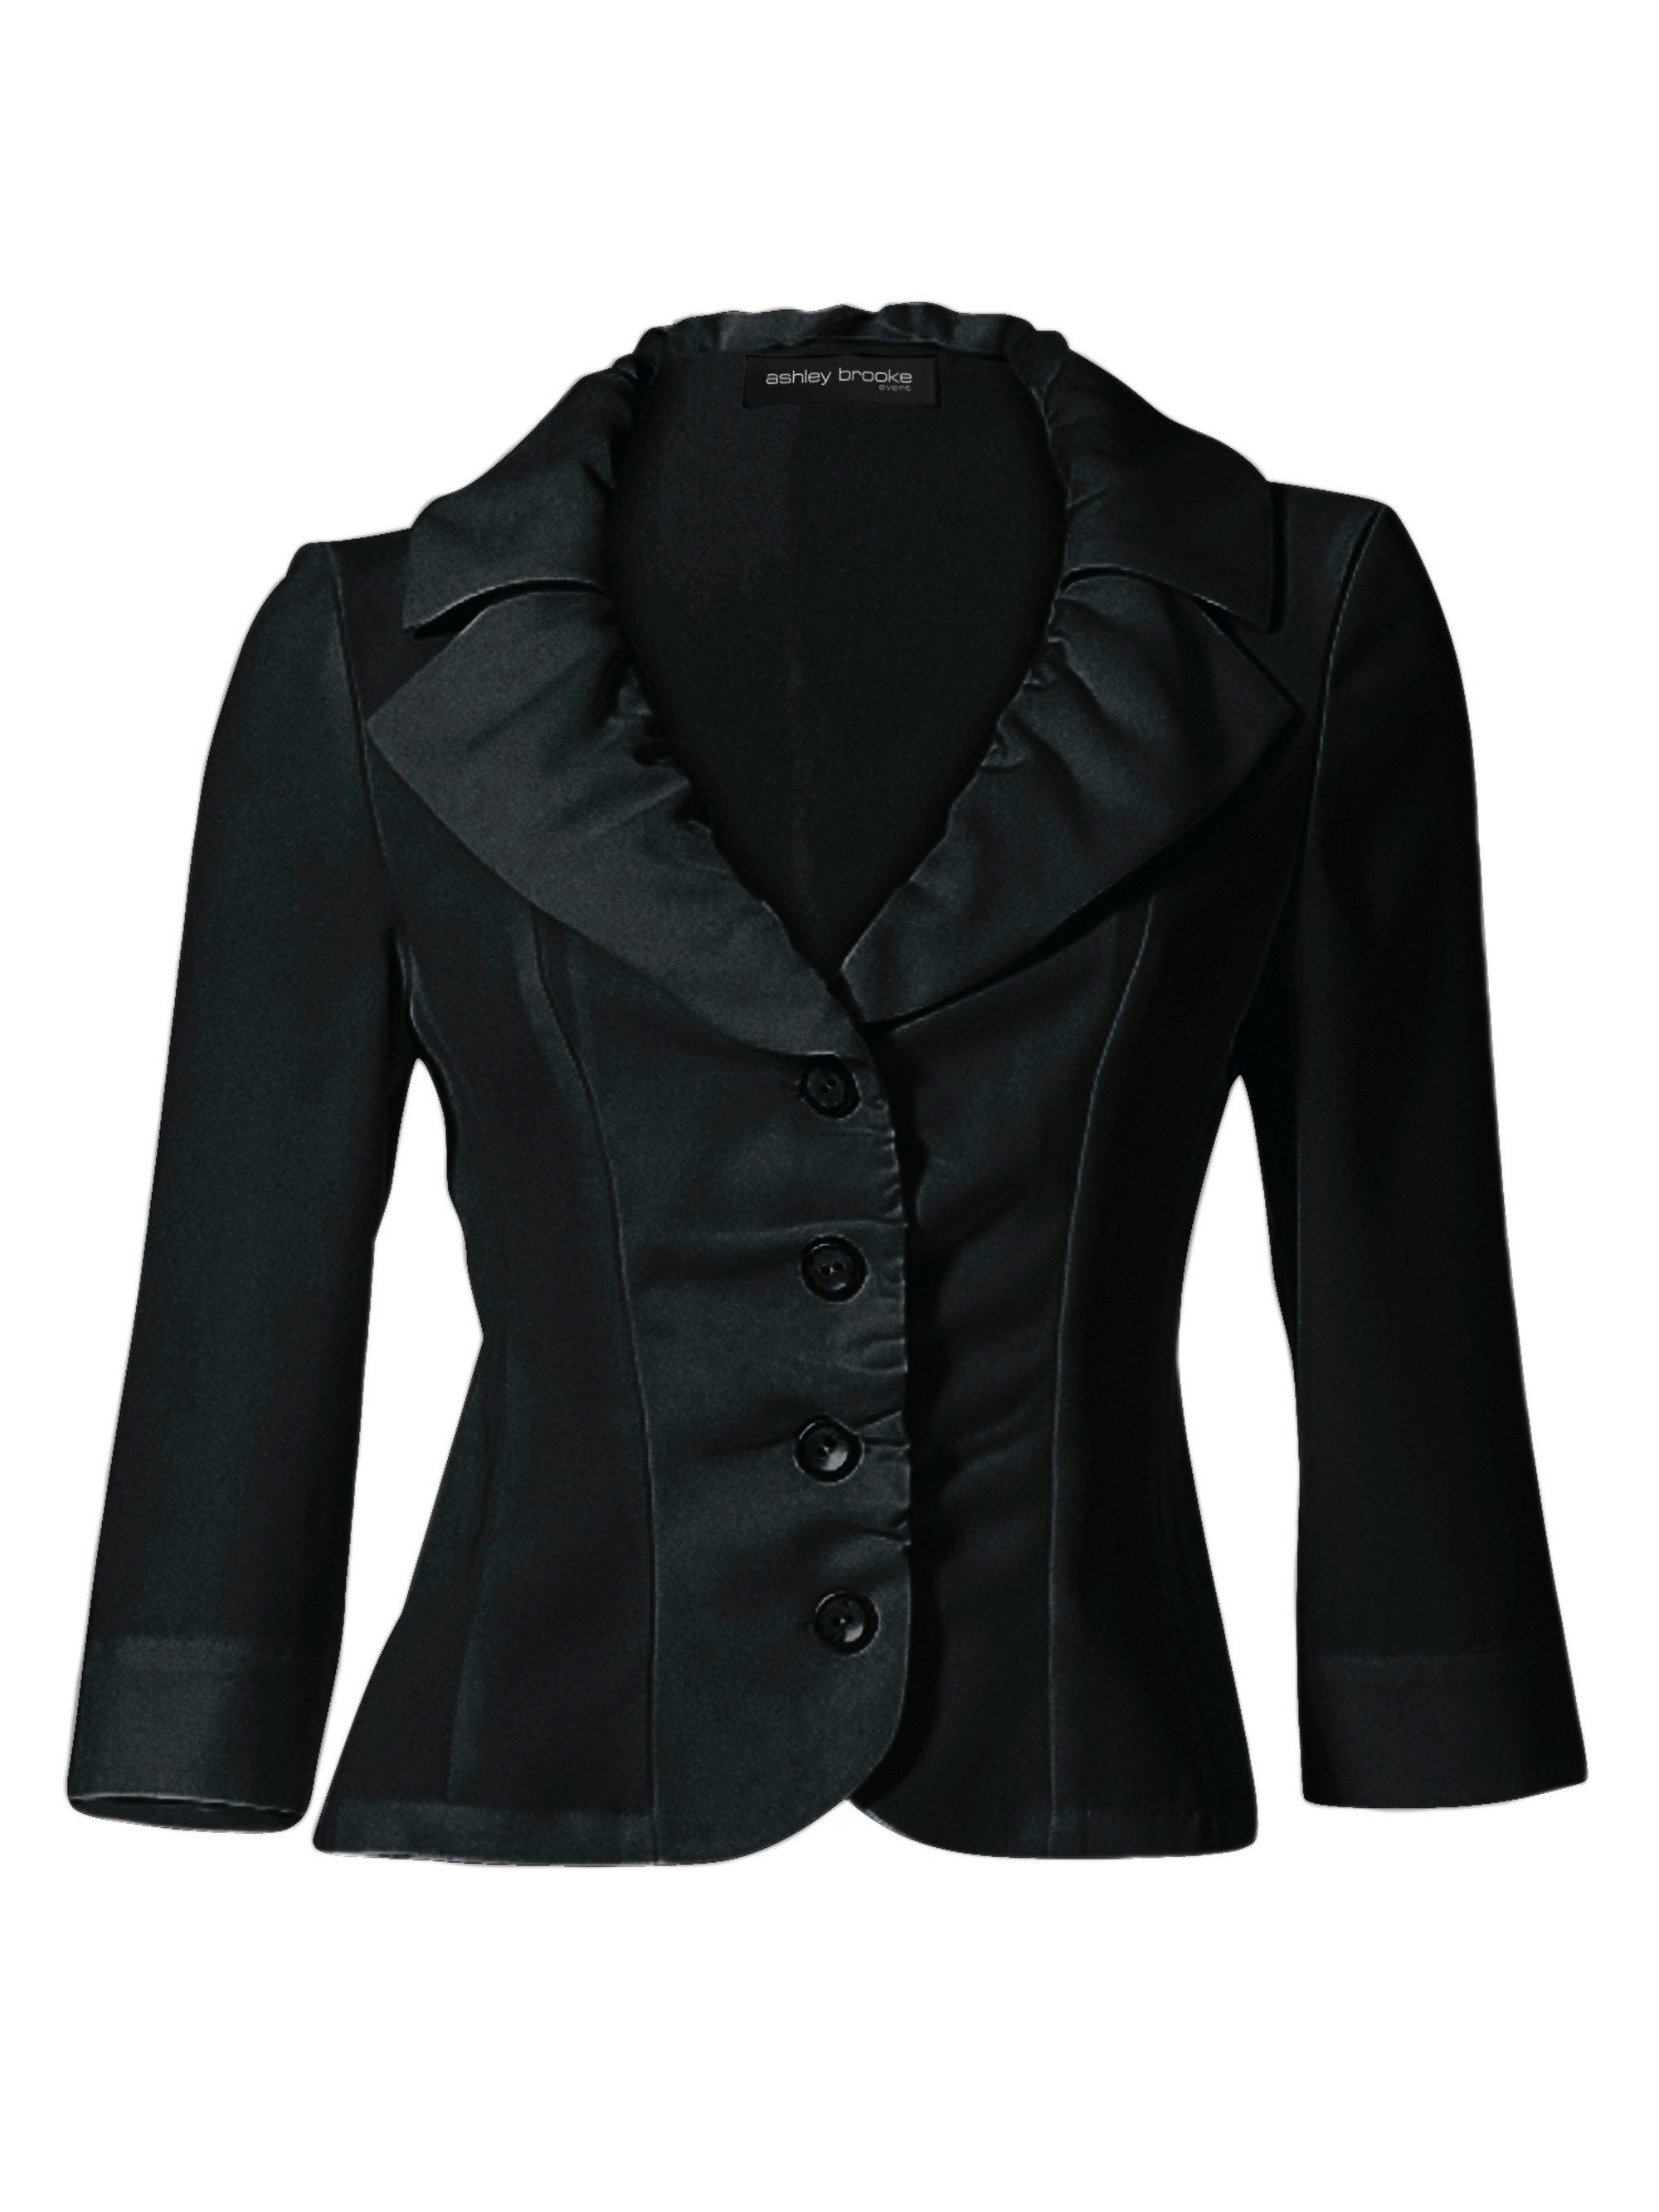 Extreem Blazer kopen? Kies uit ruim 787 hippe blazers | OTTO NN51